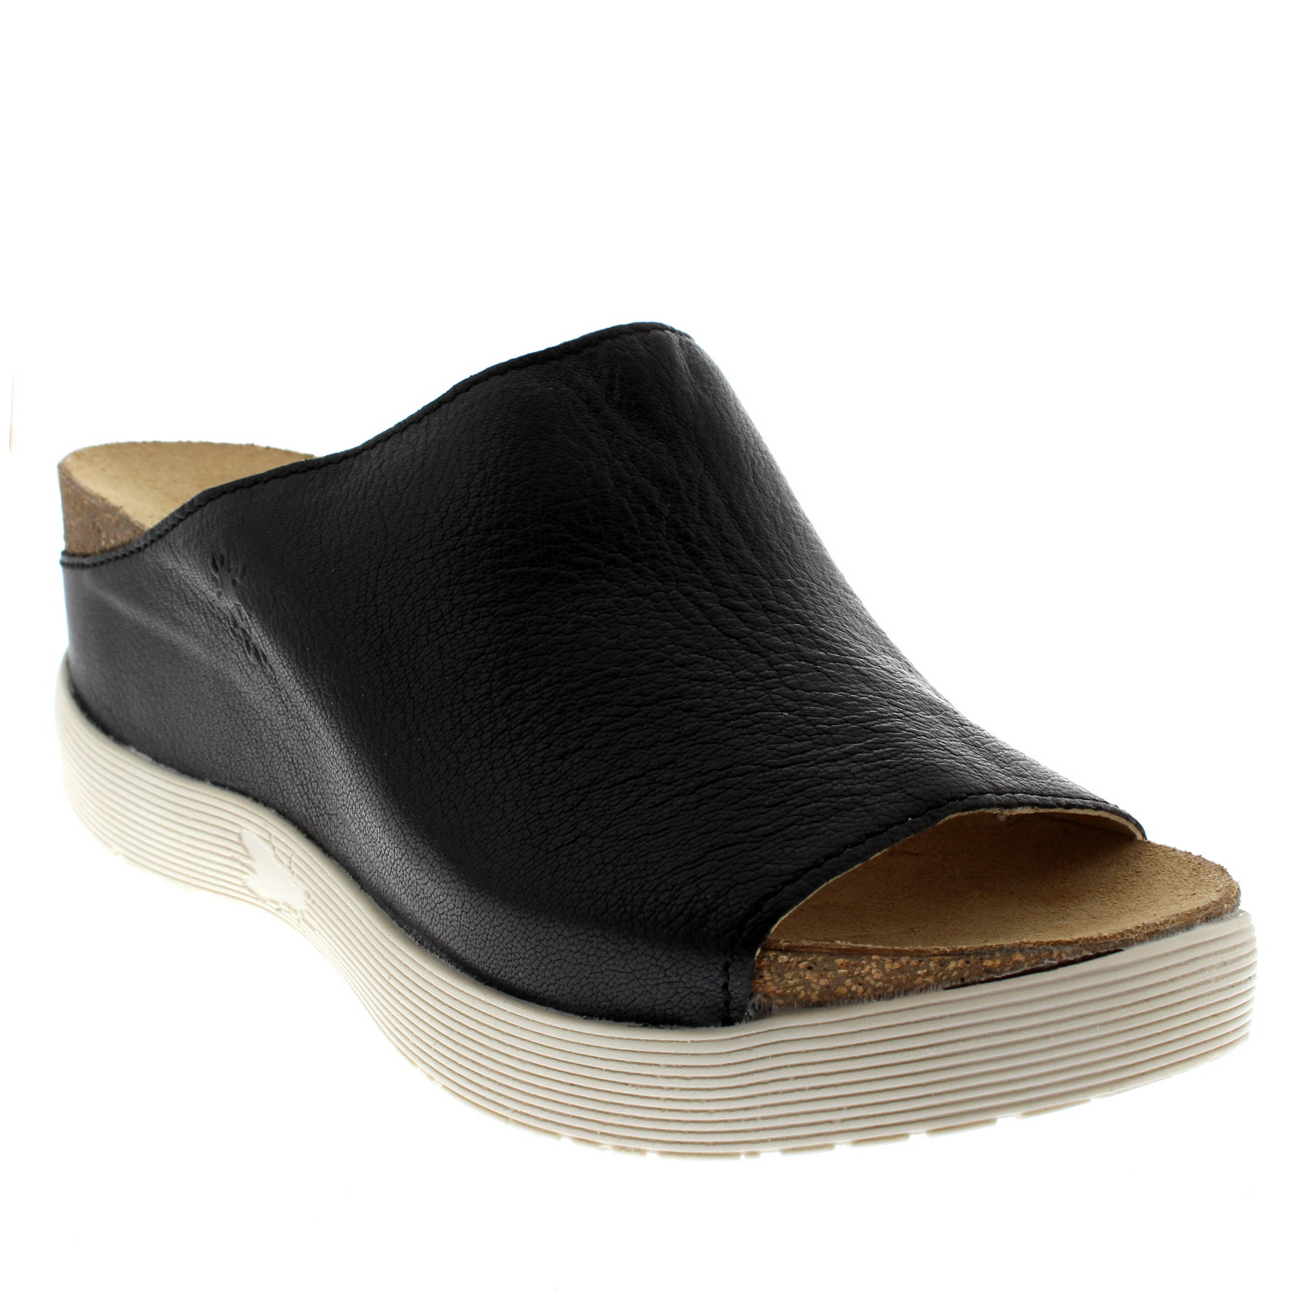 Damenschuhe Fly London Wigg Mousse Leder Open Toe Mules Wedge Heel Sandale UK 3-9